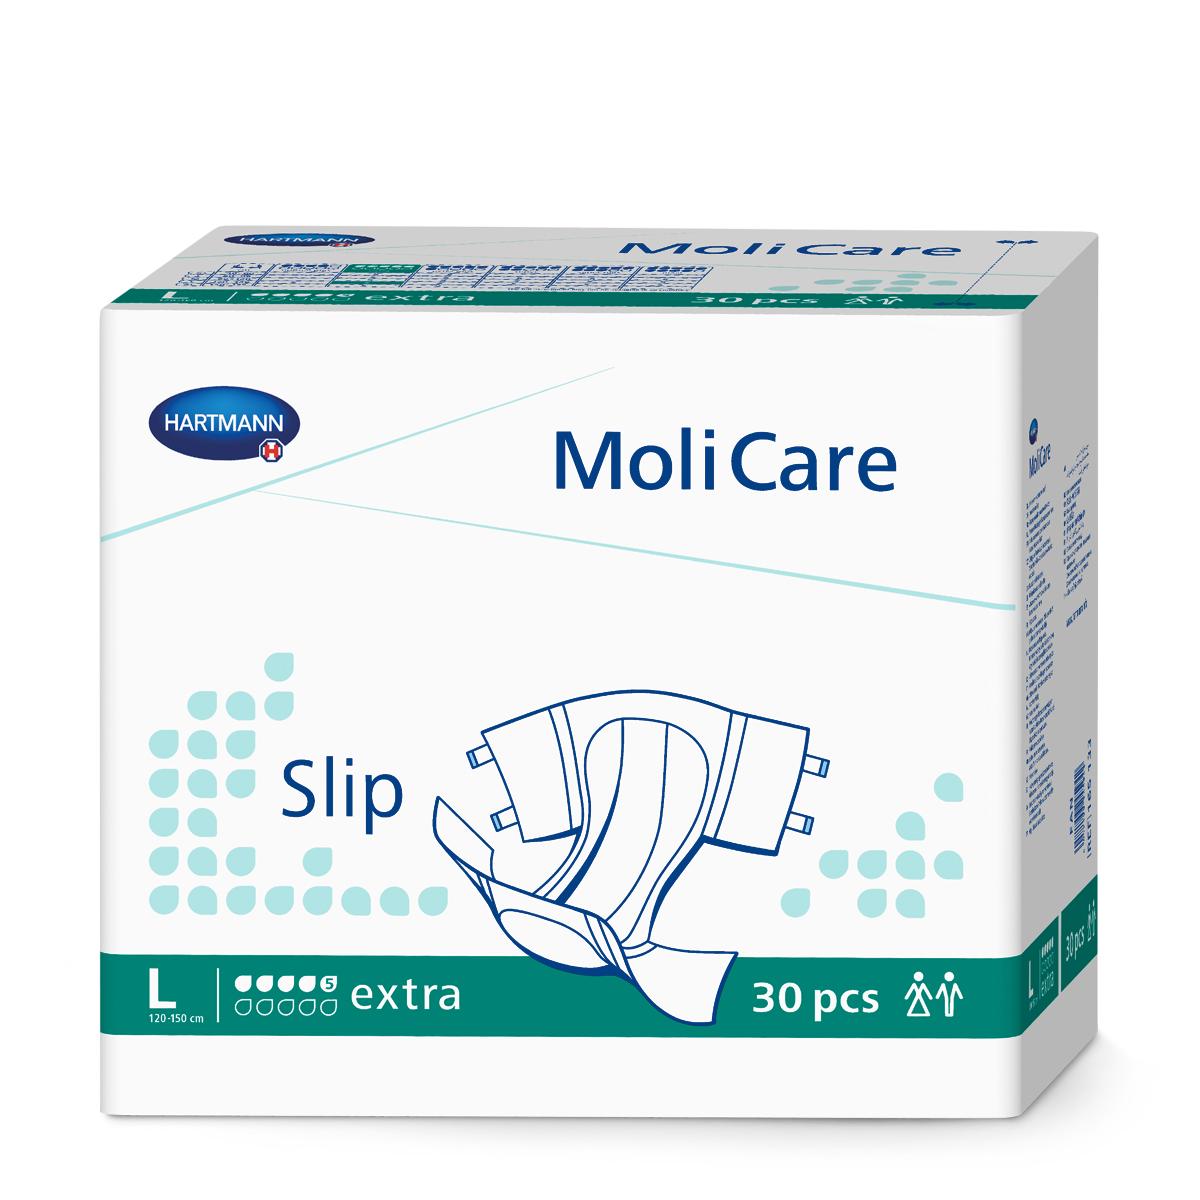 MoliCare® Slip - Extra (5 Tropfen) Gr. 3 Large 30 Stück